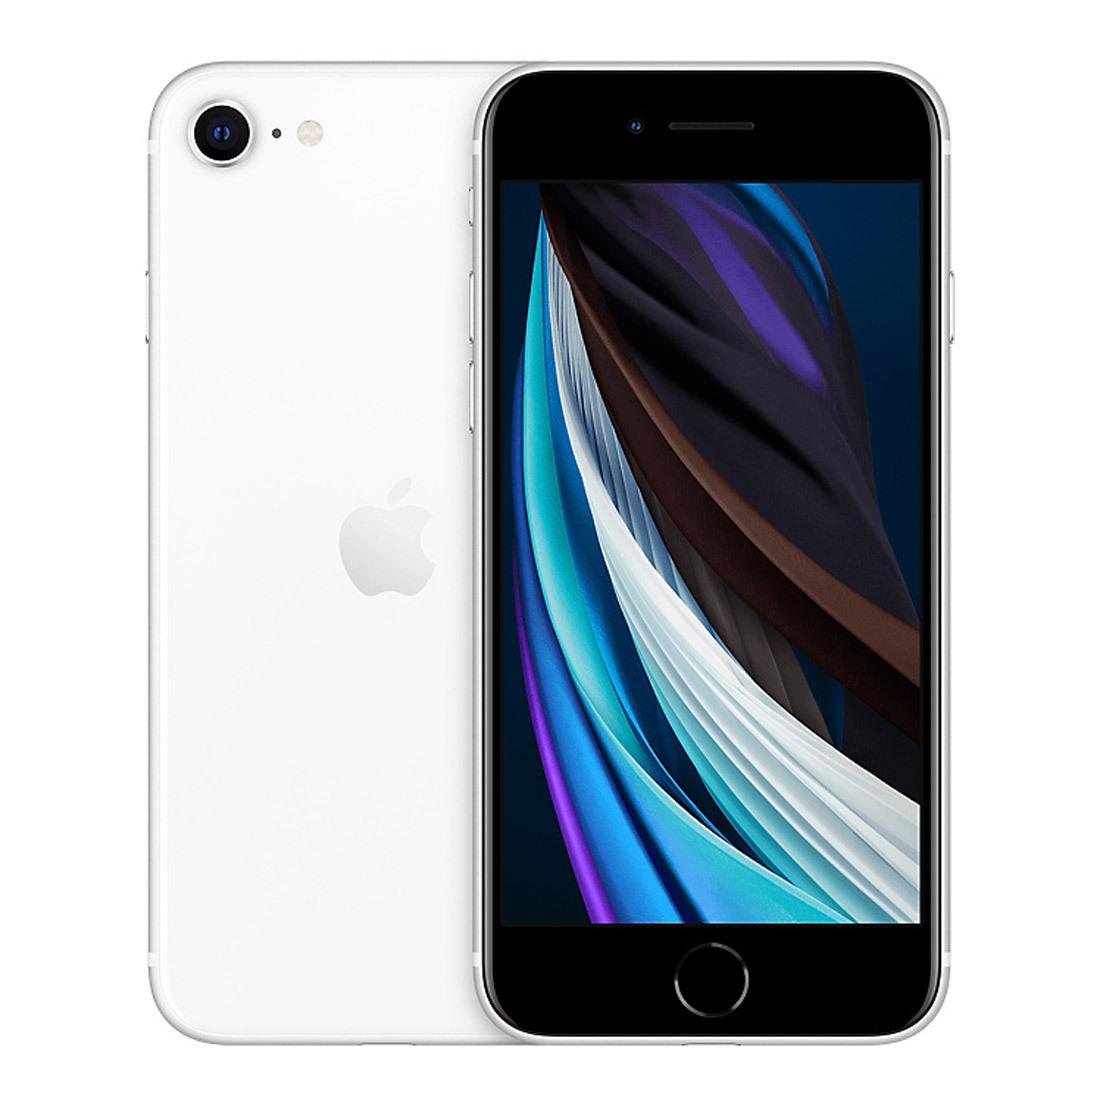 Apple iPhone SE (2020, Gen 2) 64GB MX9T2X/A - White ...